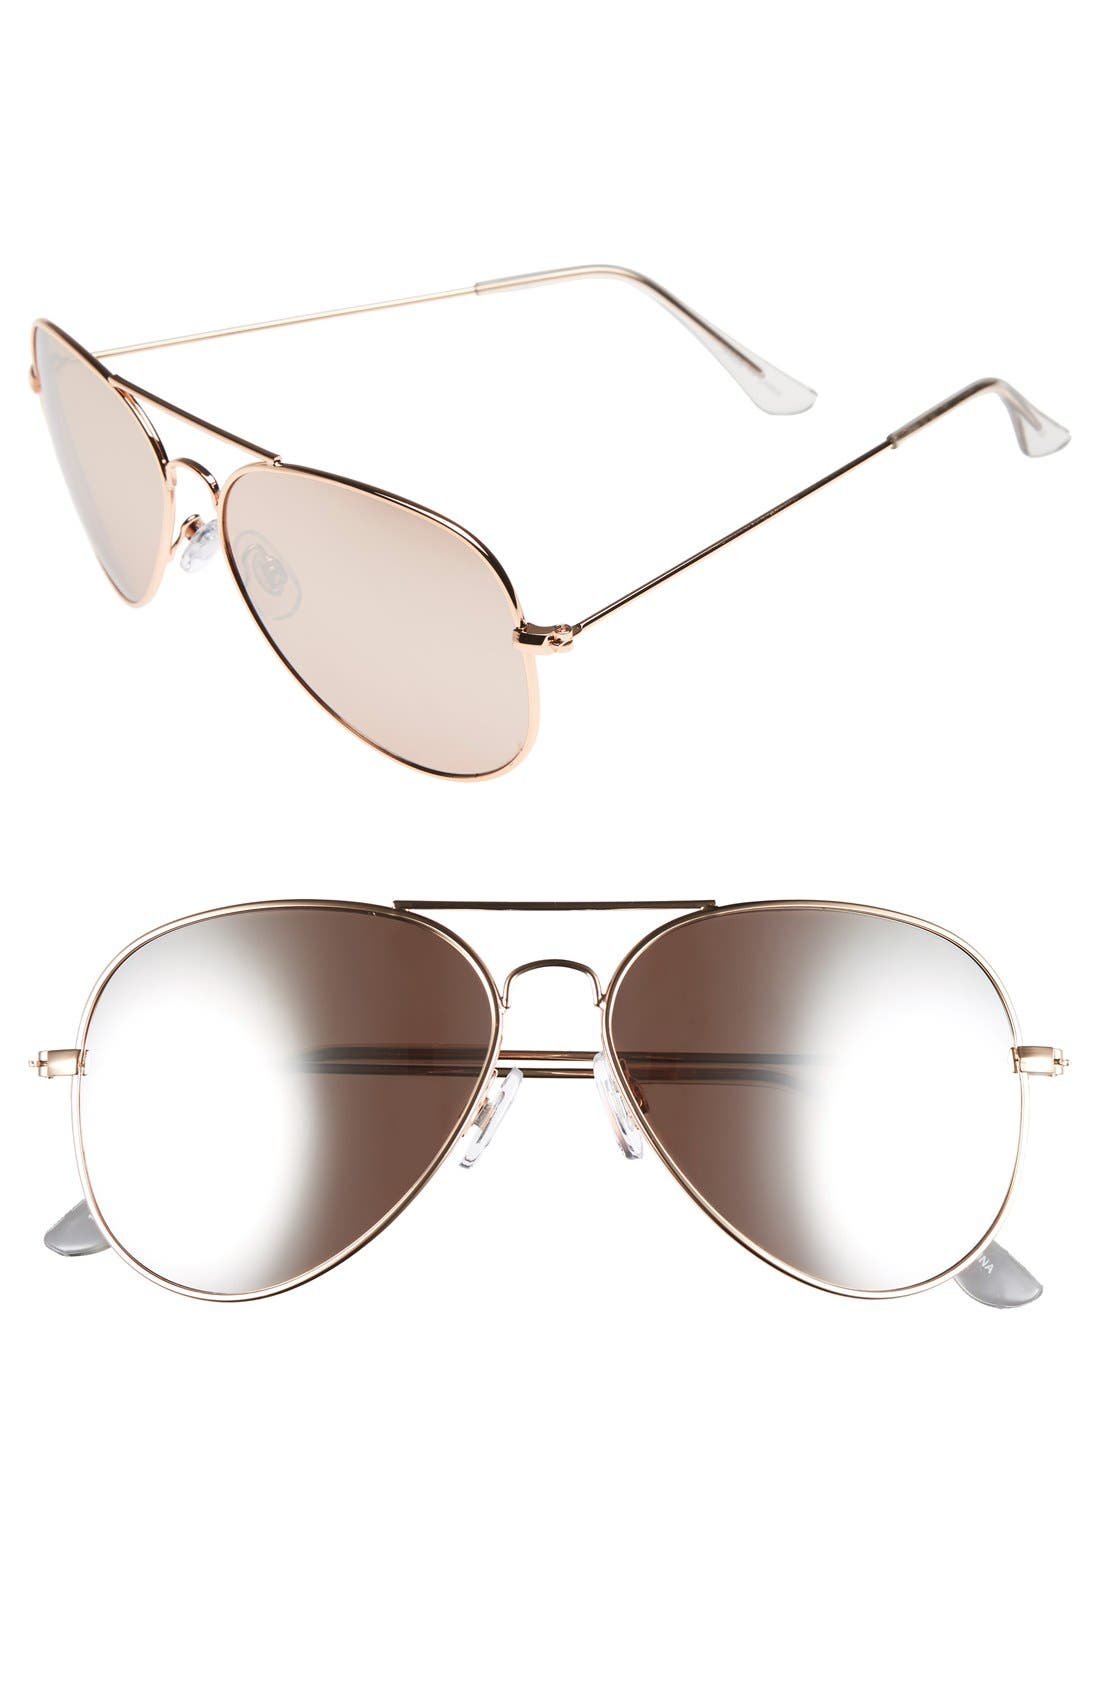 Mirrored Aviator 57mm Sunglasses,                         Main,                         color, Rose Gold